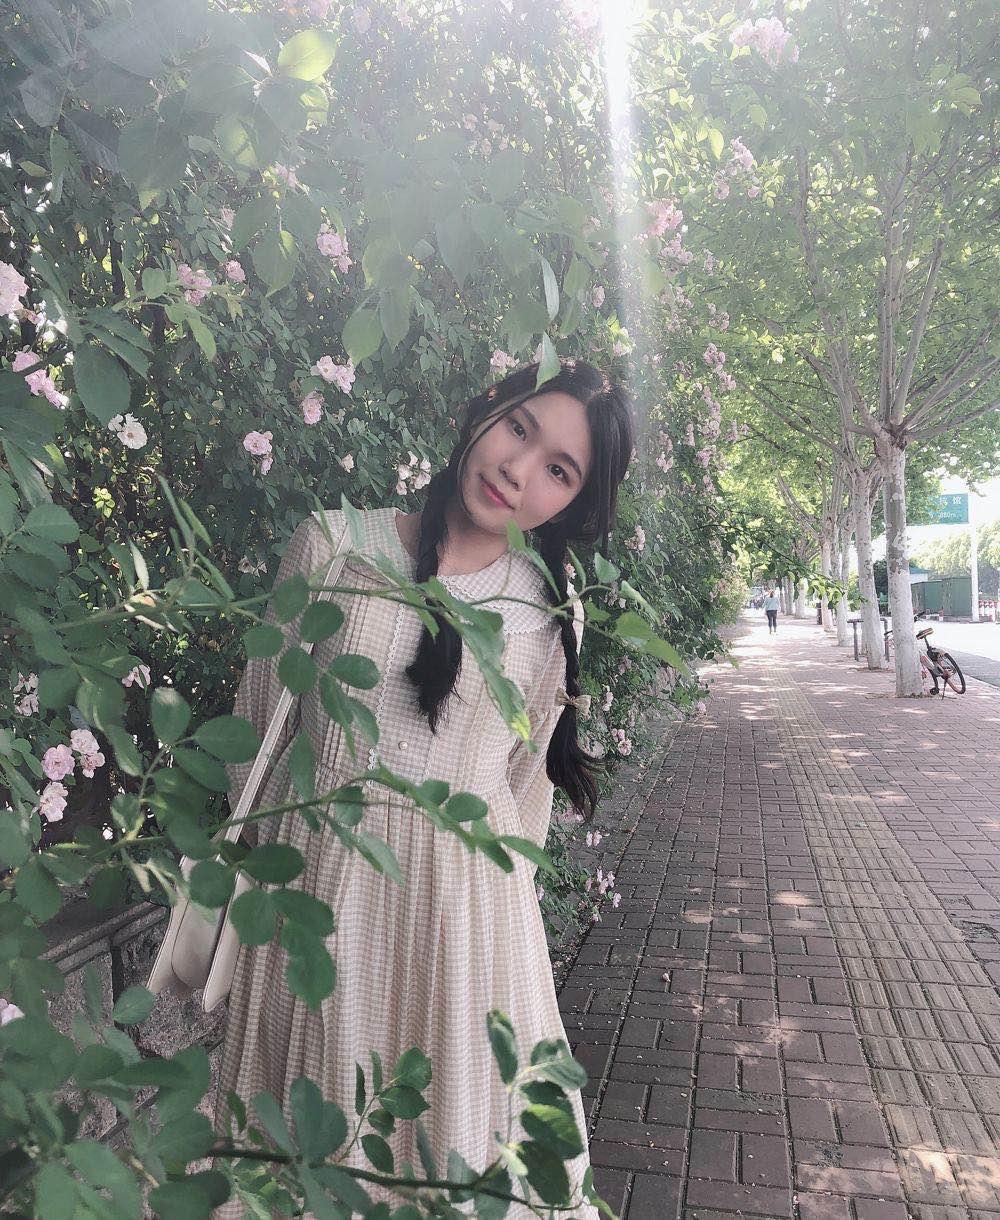 Kexin Qi (齐珂心) : Graduate Student